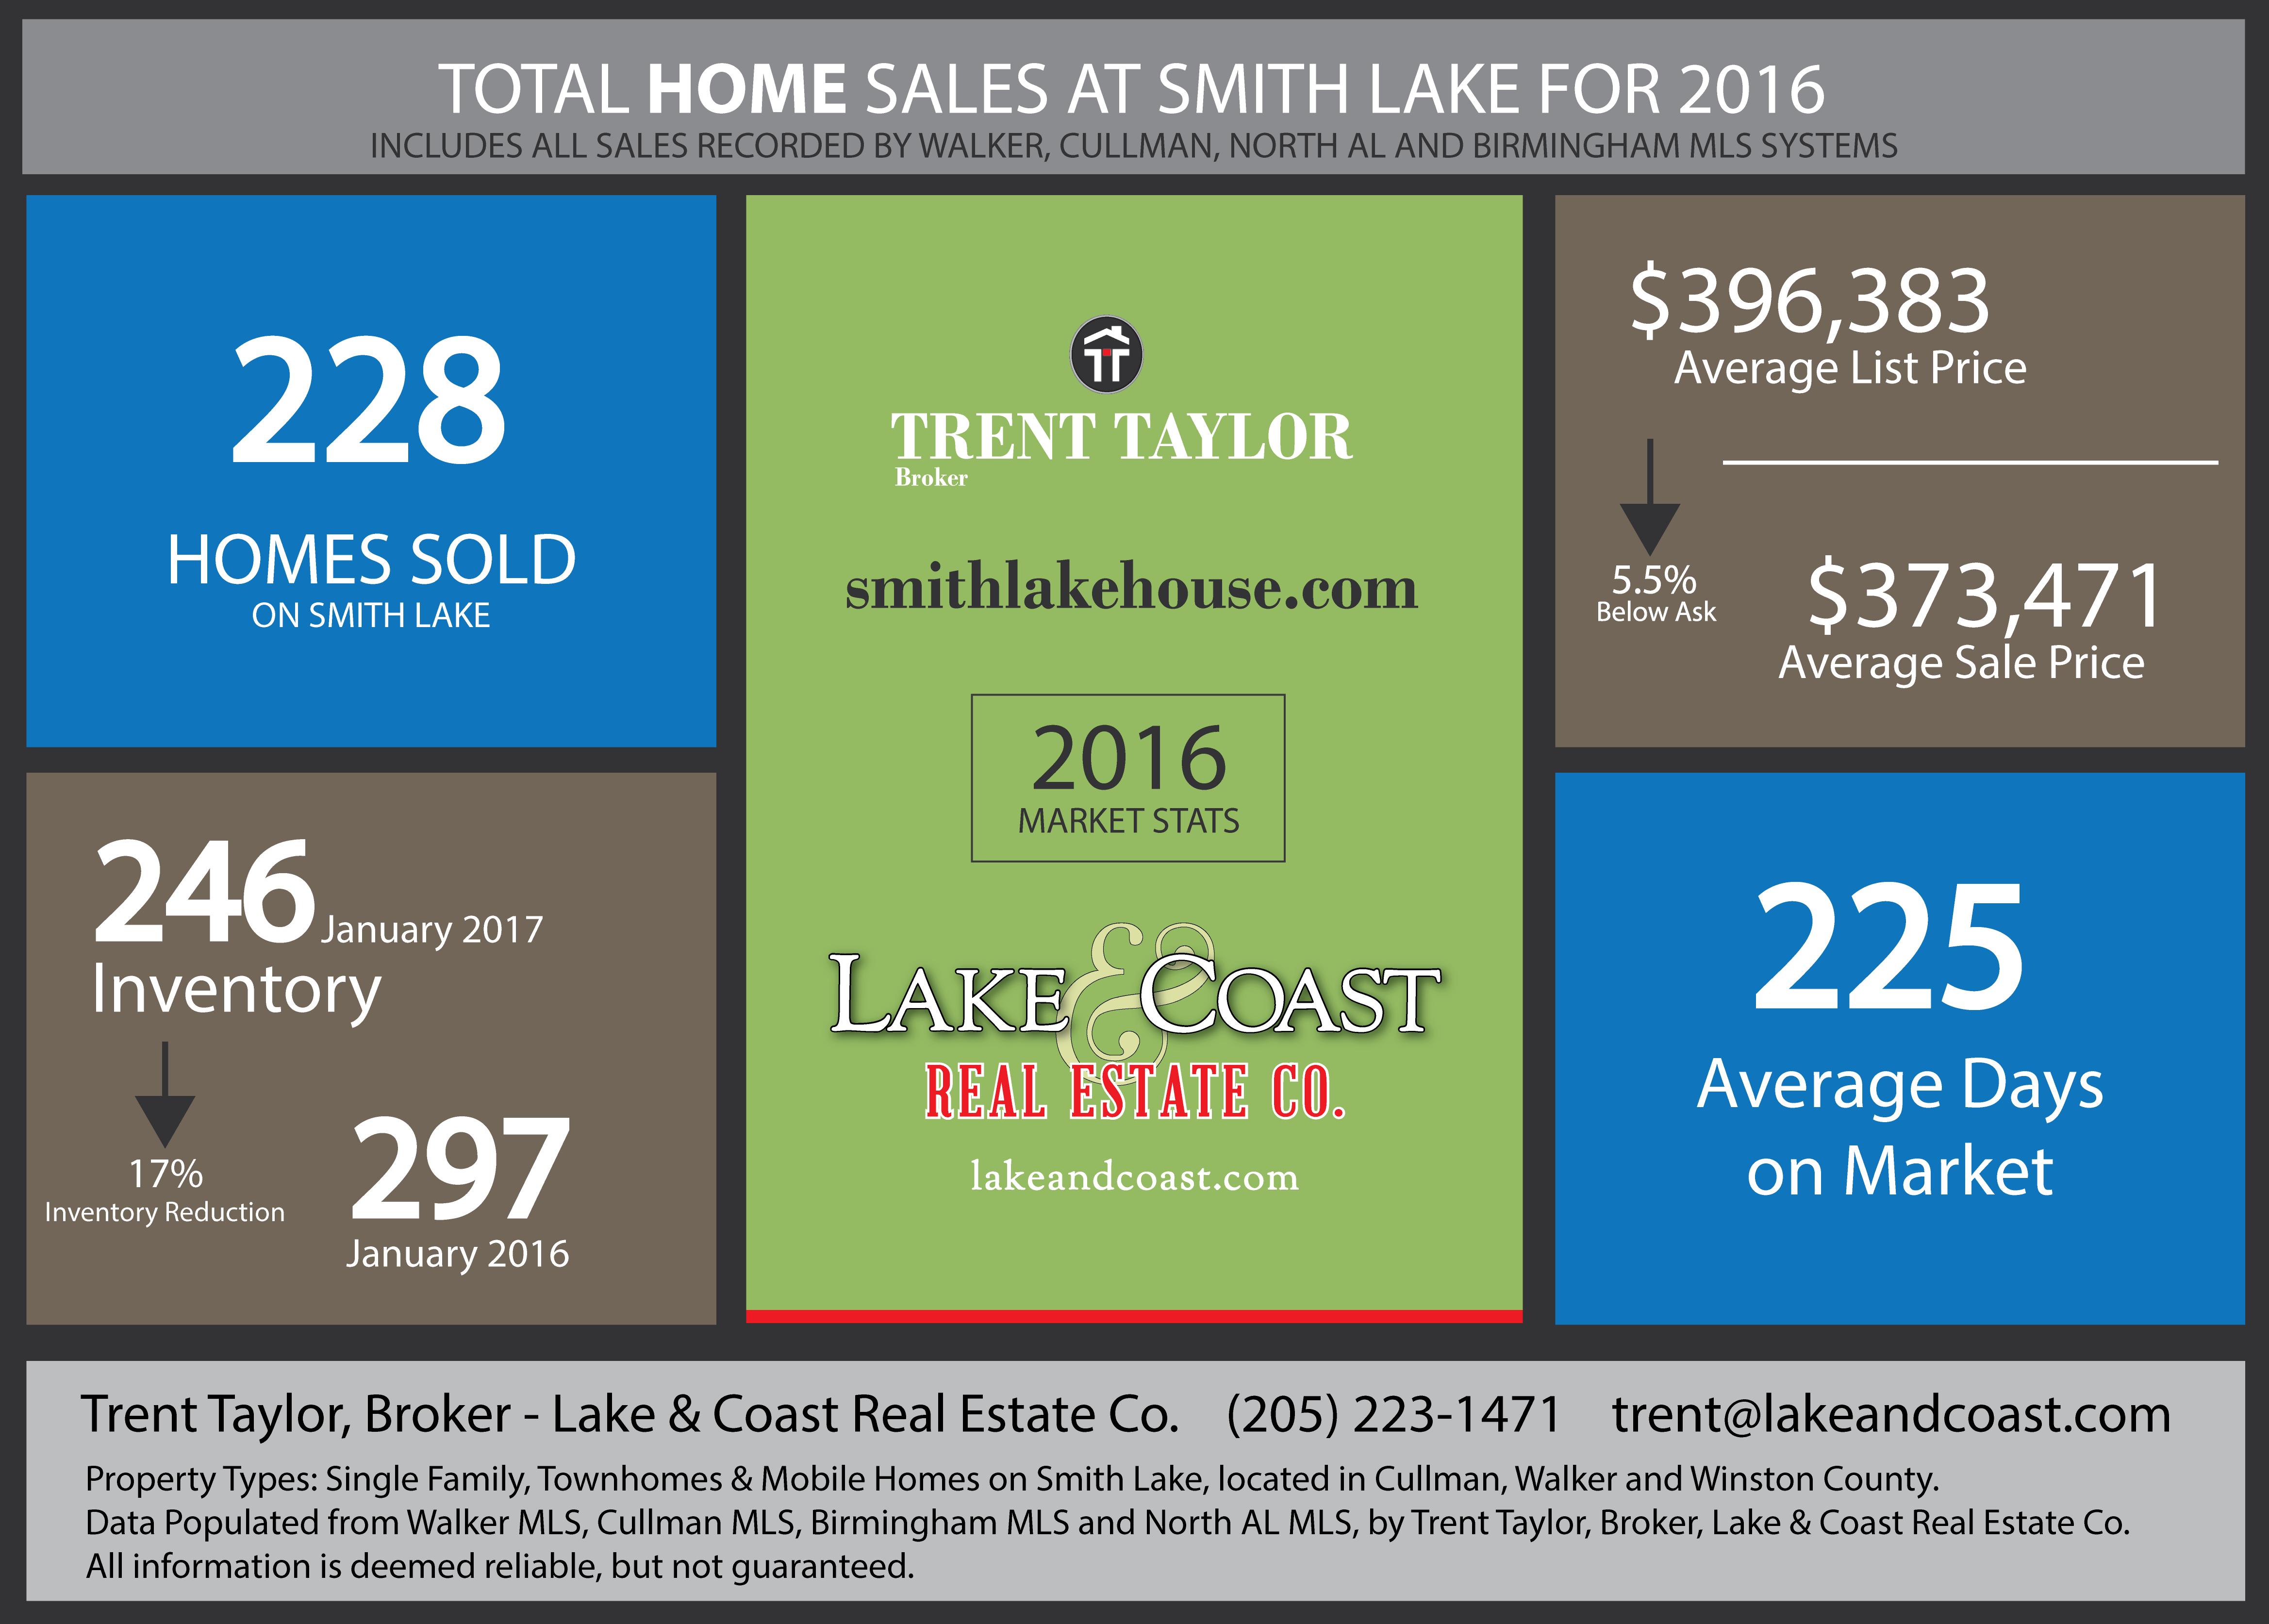 2016 Smith Lake Home Sale Report